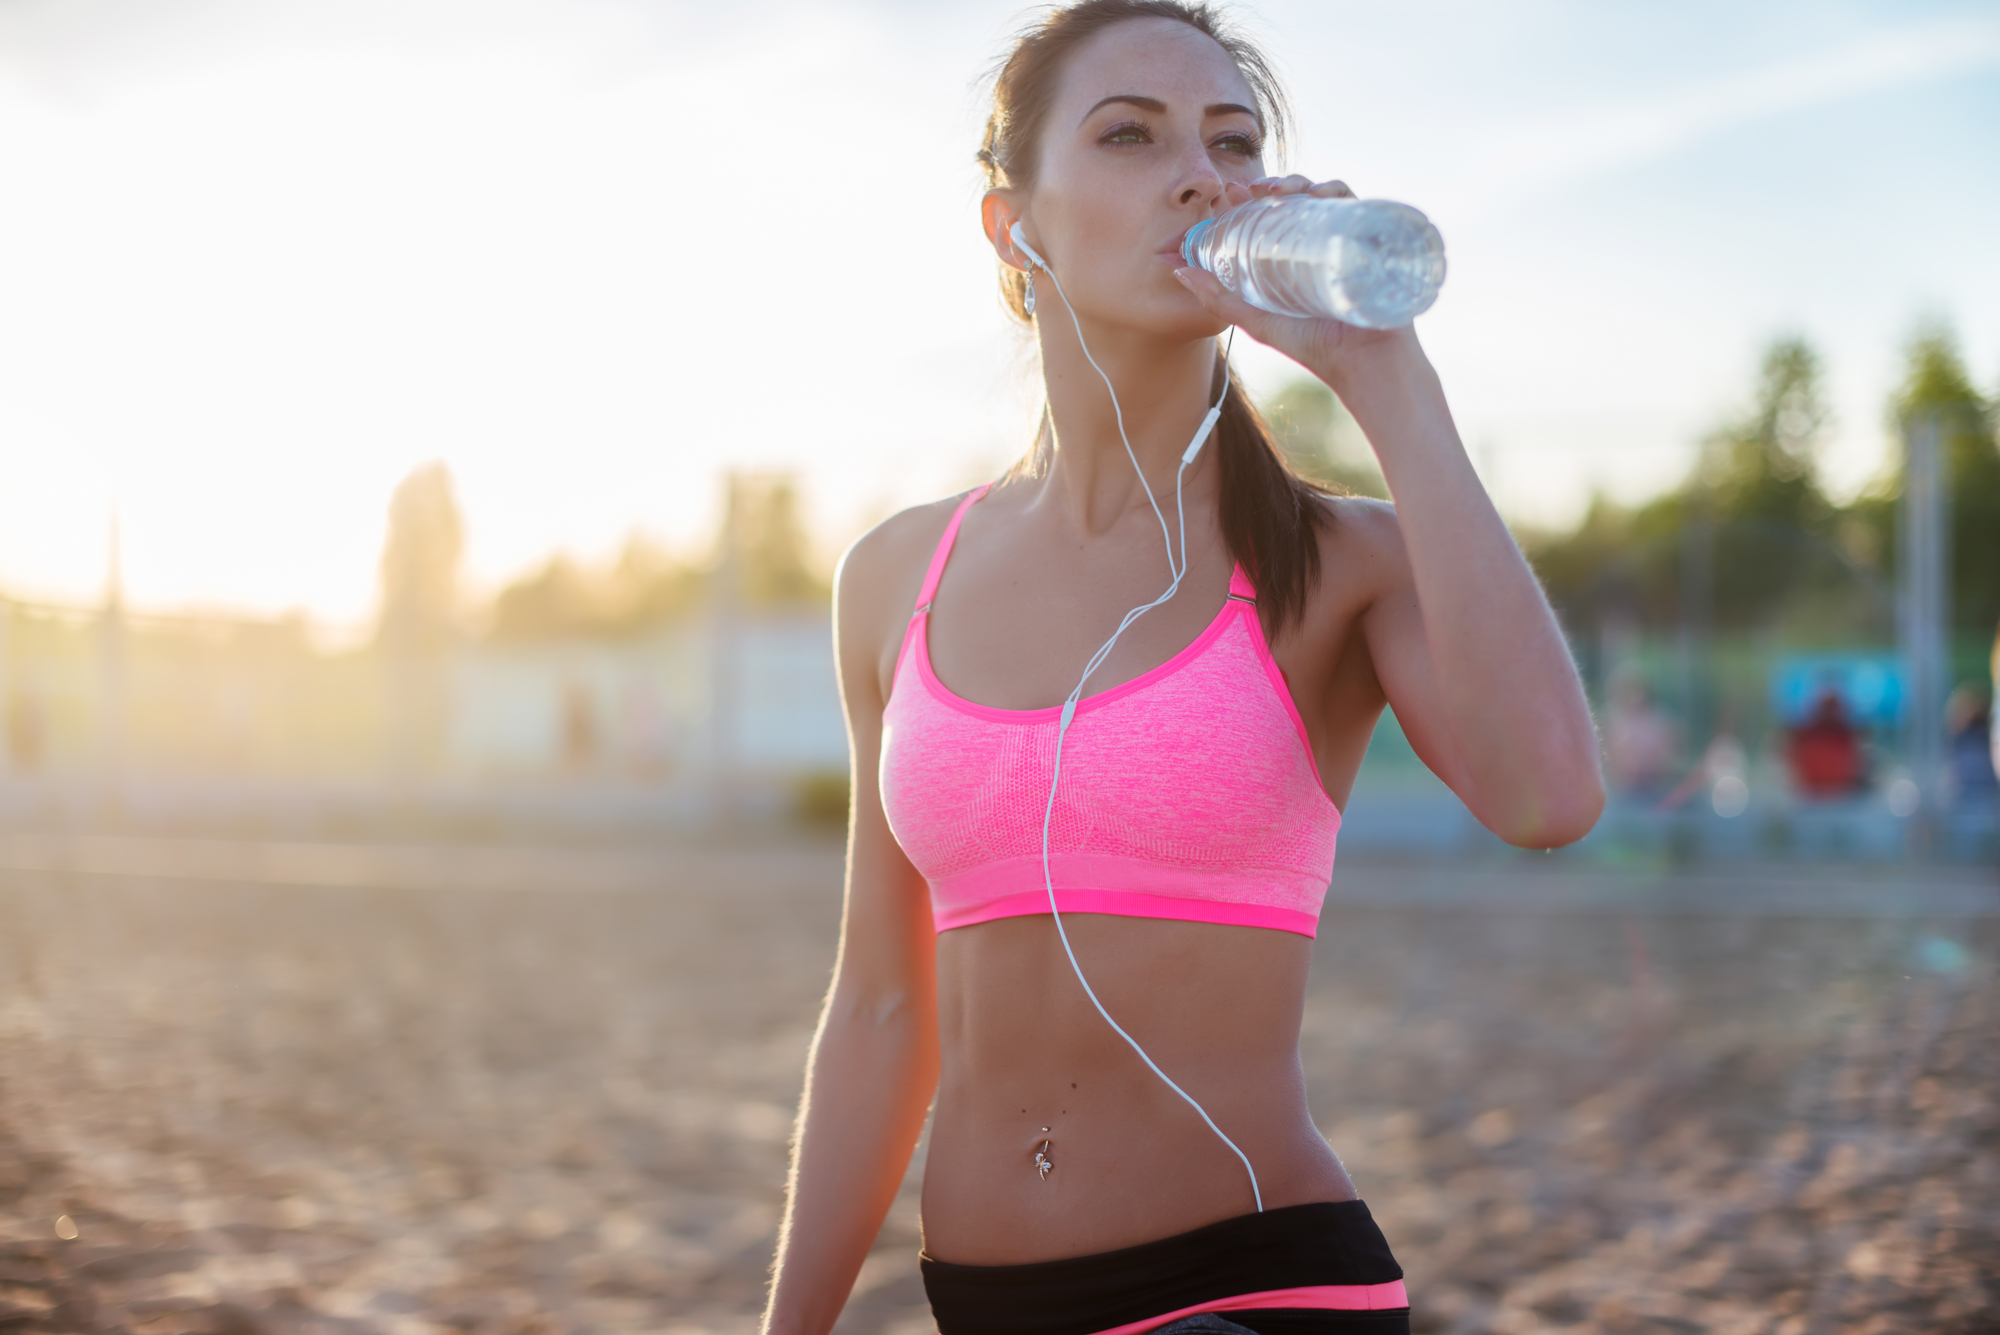 Tre råd: Sådan får du en sund sommer